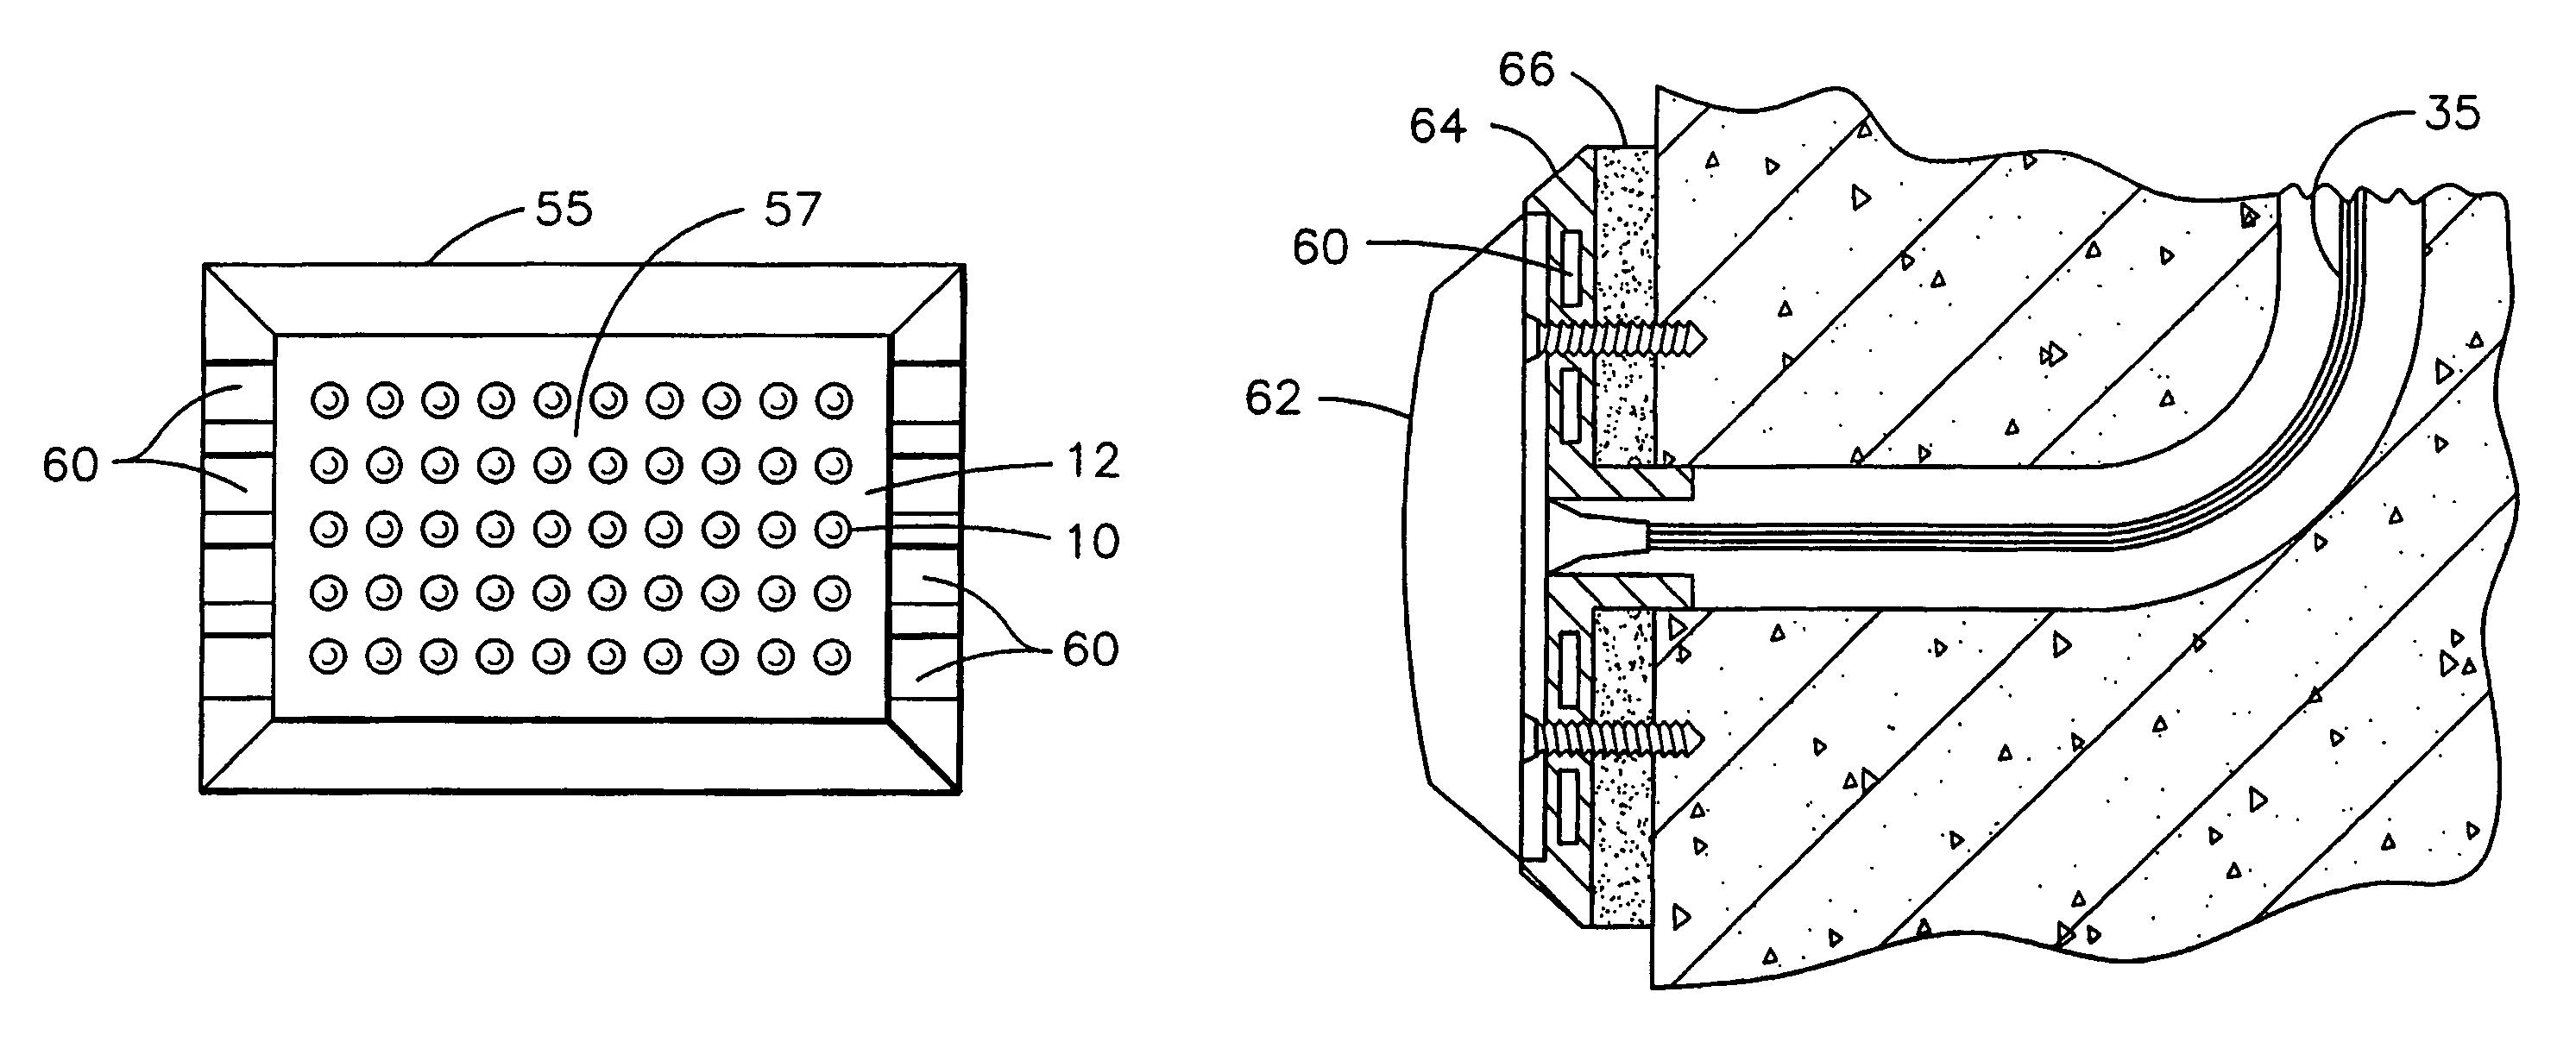 Swimming Pool Light Wiring Diagram Schematics and Wiring Diagrams – Pool Light Wiring Diagram